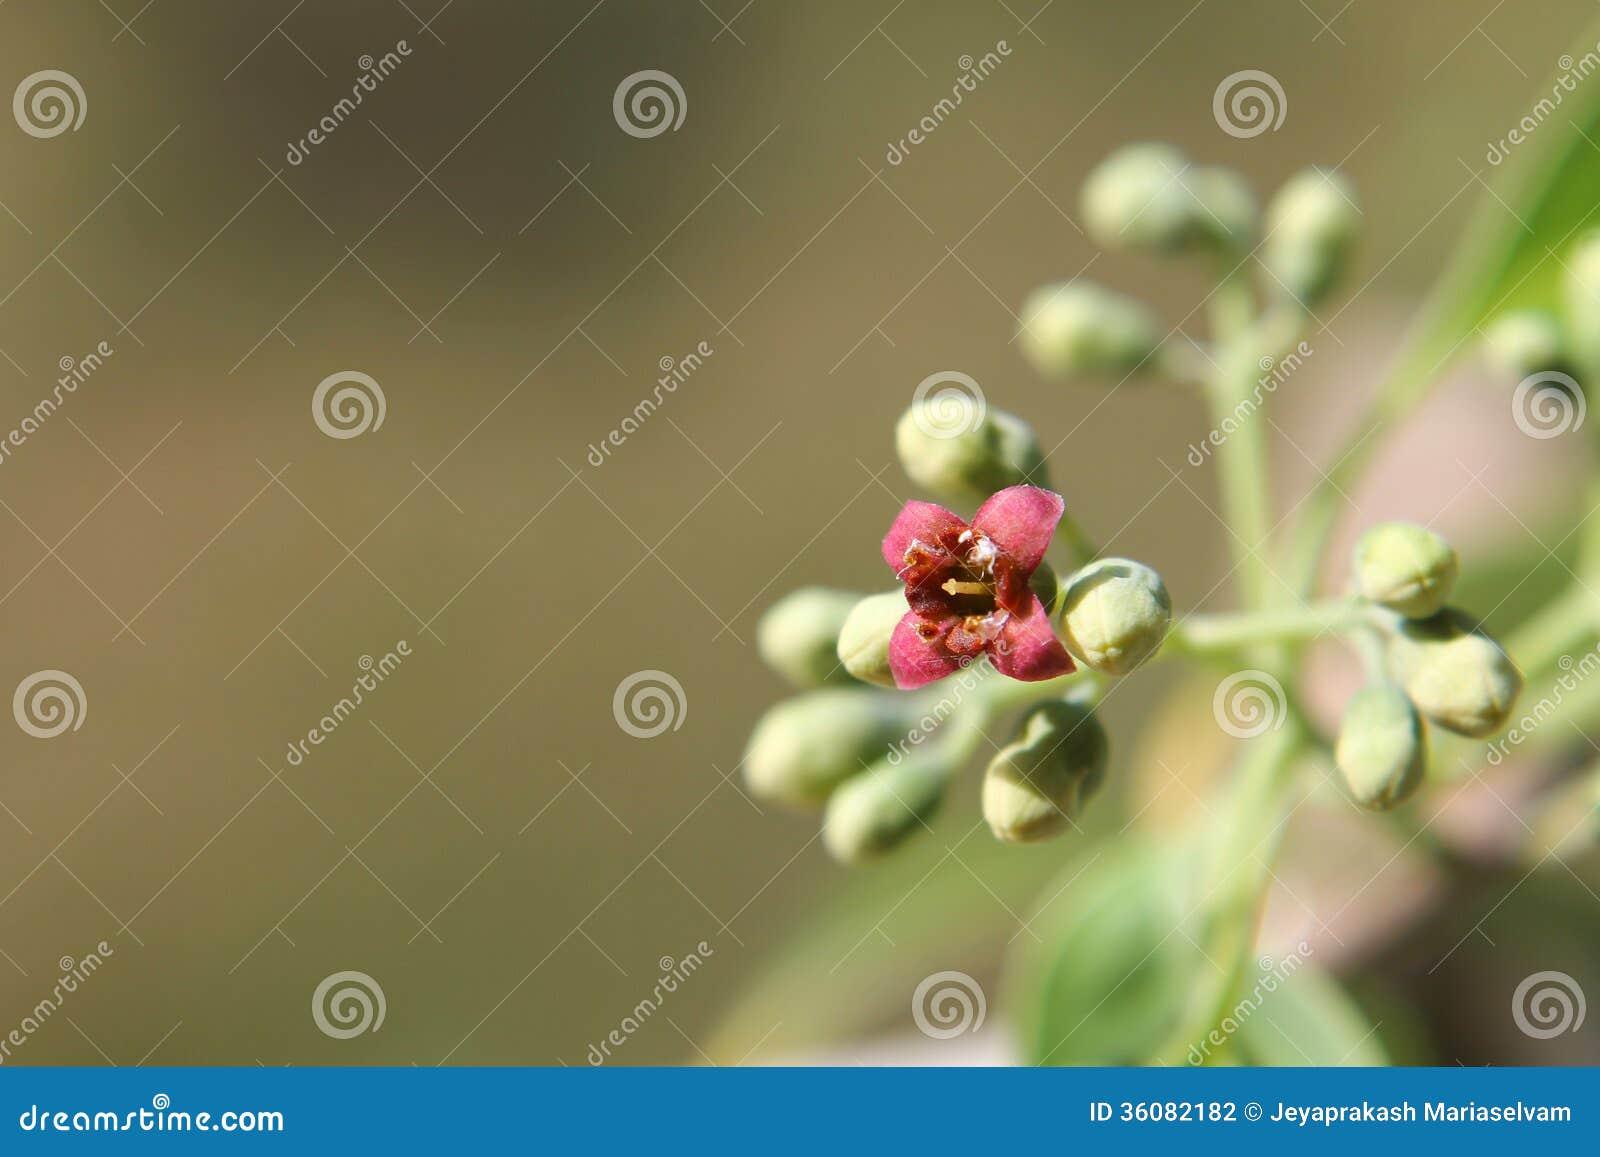 Macro de la inflorescencia del álbum del Santalum, árbol indio de madera de la sandalia